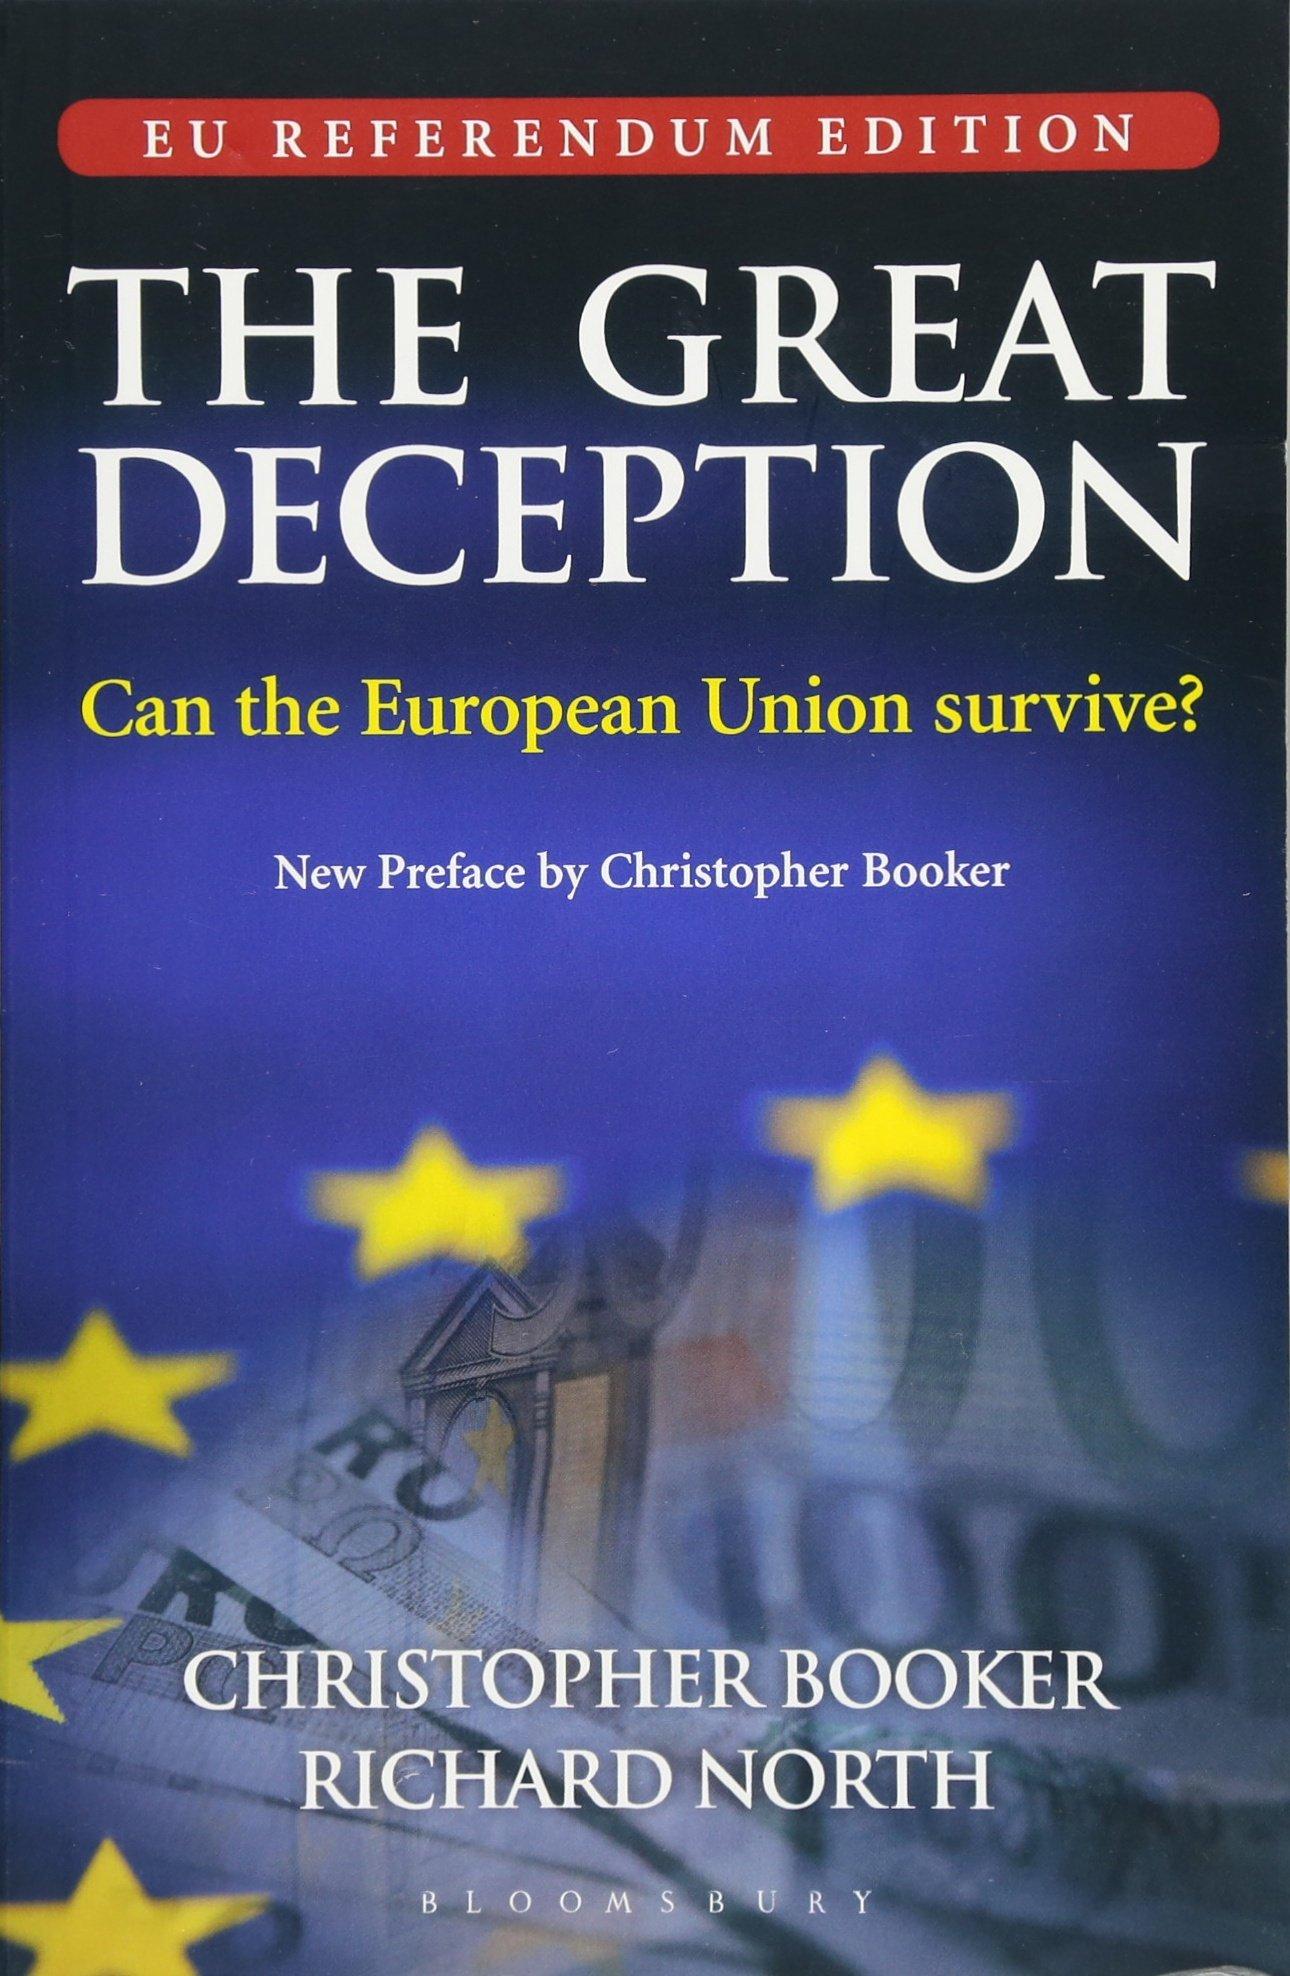 Read Online The Great Deception: Can the European Union survive? - EU Referendum Edition PDF